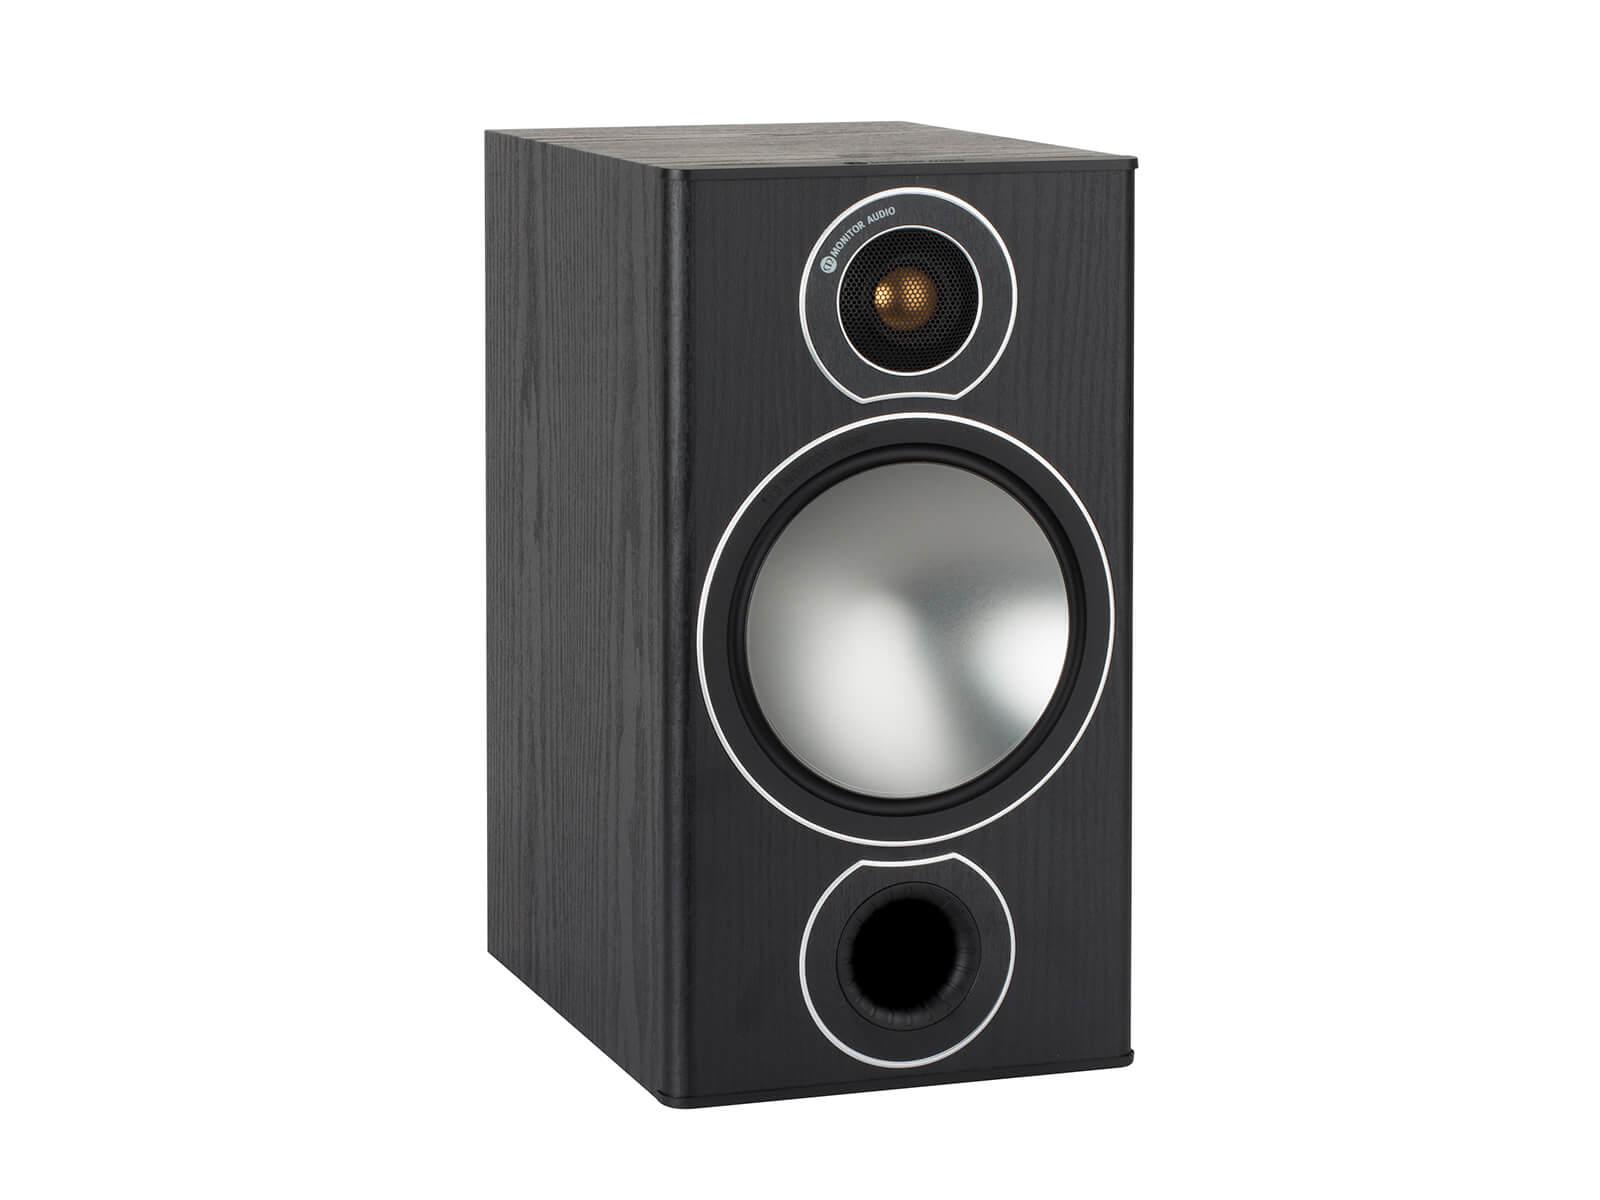 hight resolution of bronze 2 grille less bookshelf speakers with a black oak vinyl finish